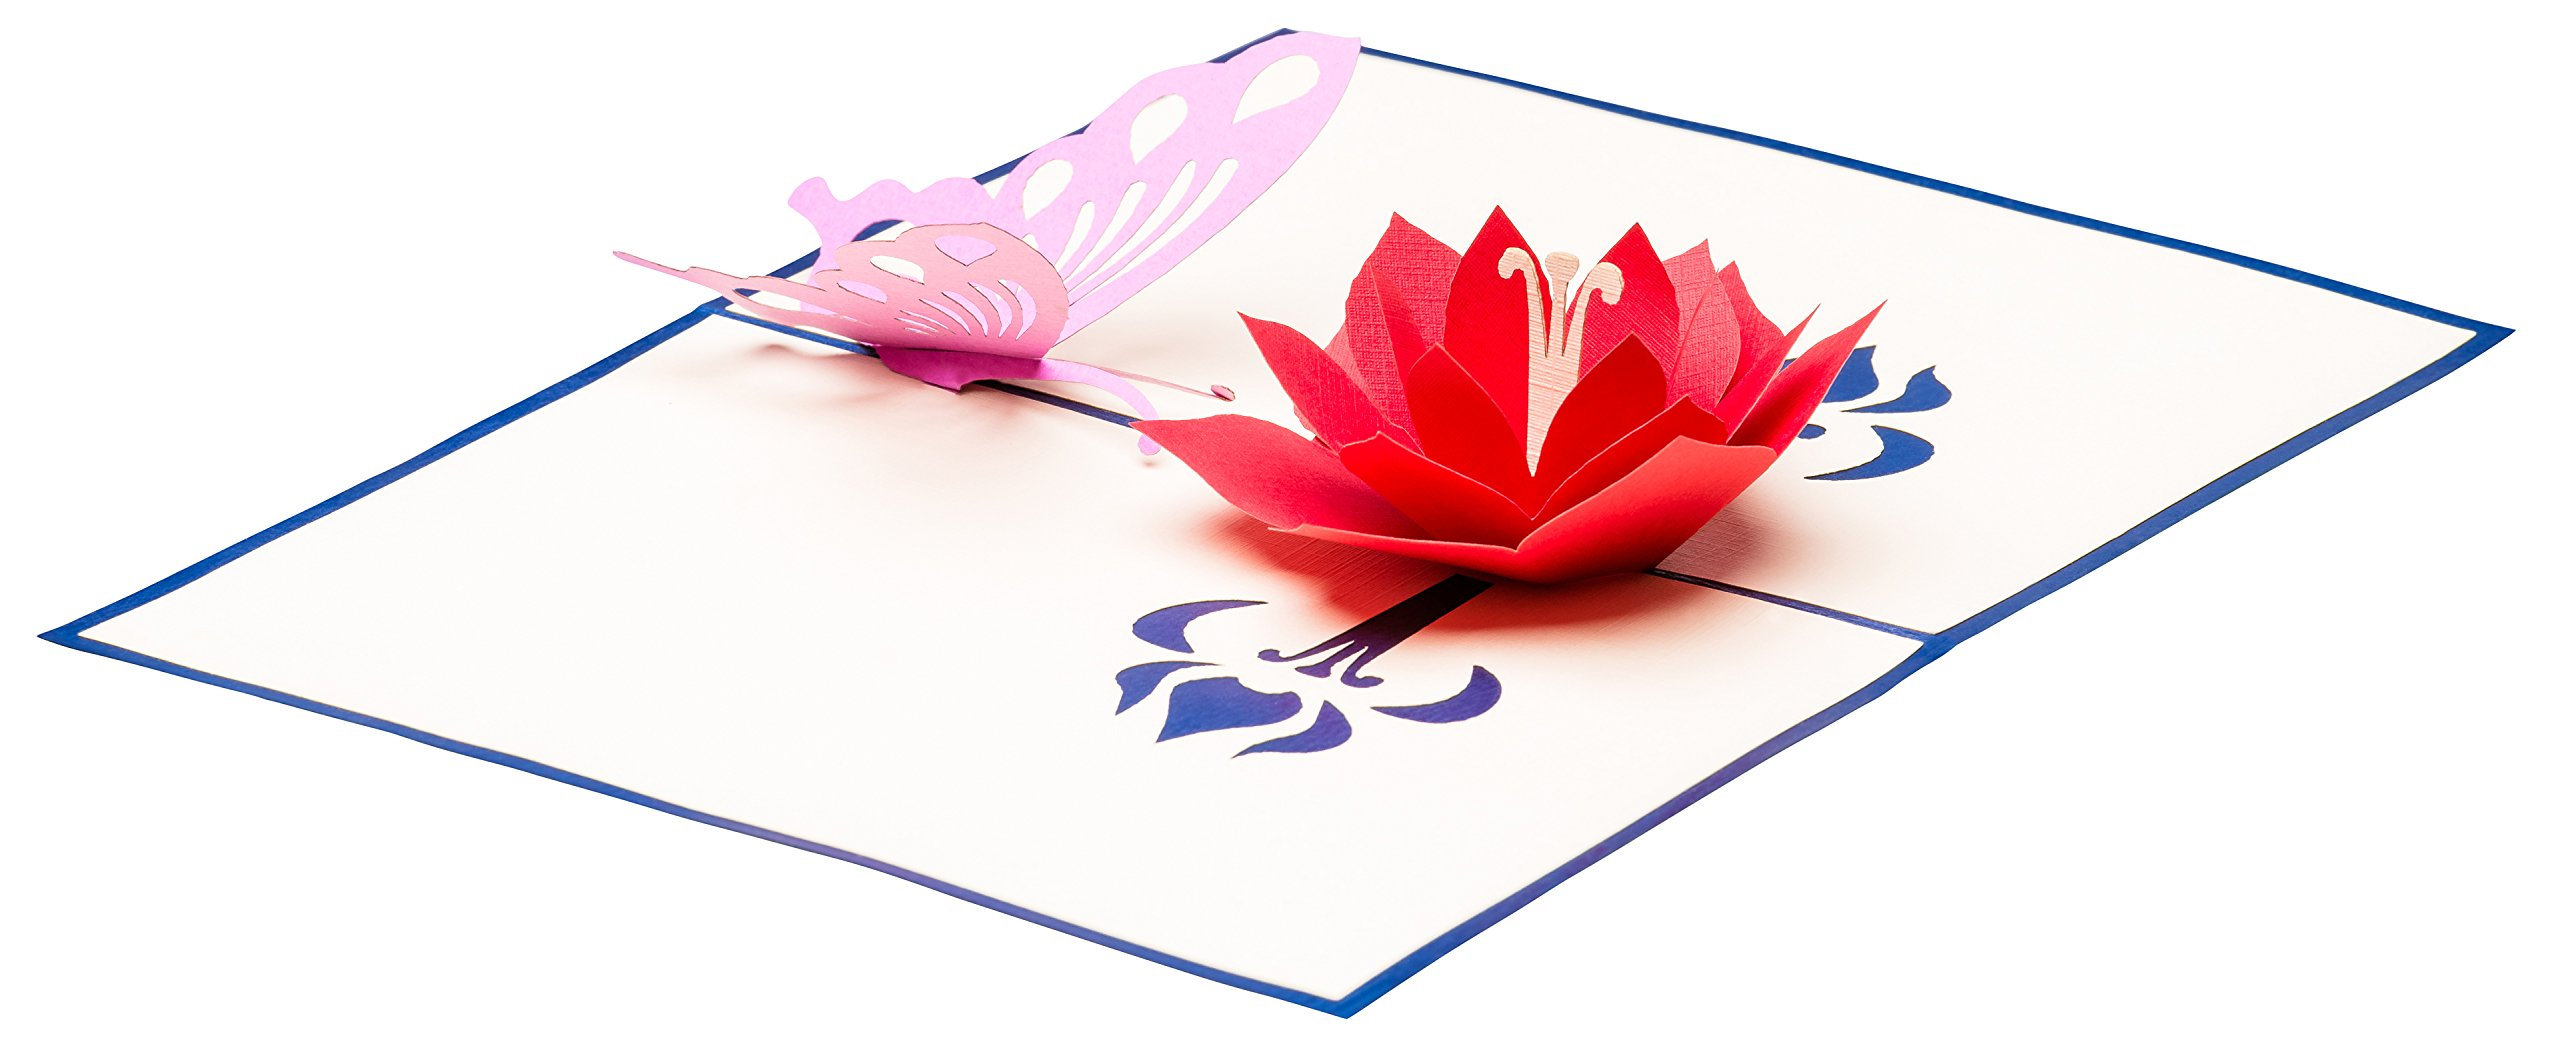 "Muttertagskarte mit Blume primetea 3D Pop up Geburtstagskarte /""Lotusblüte/"""